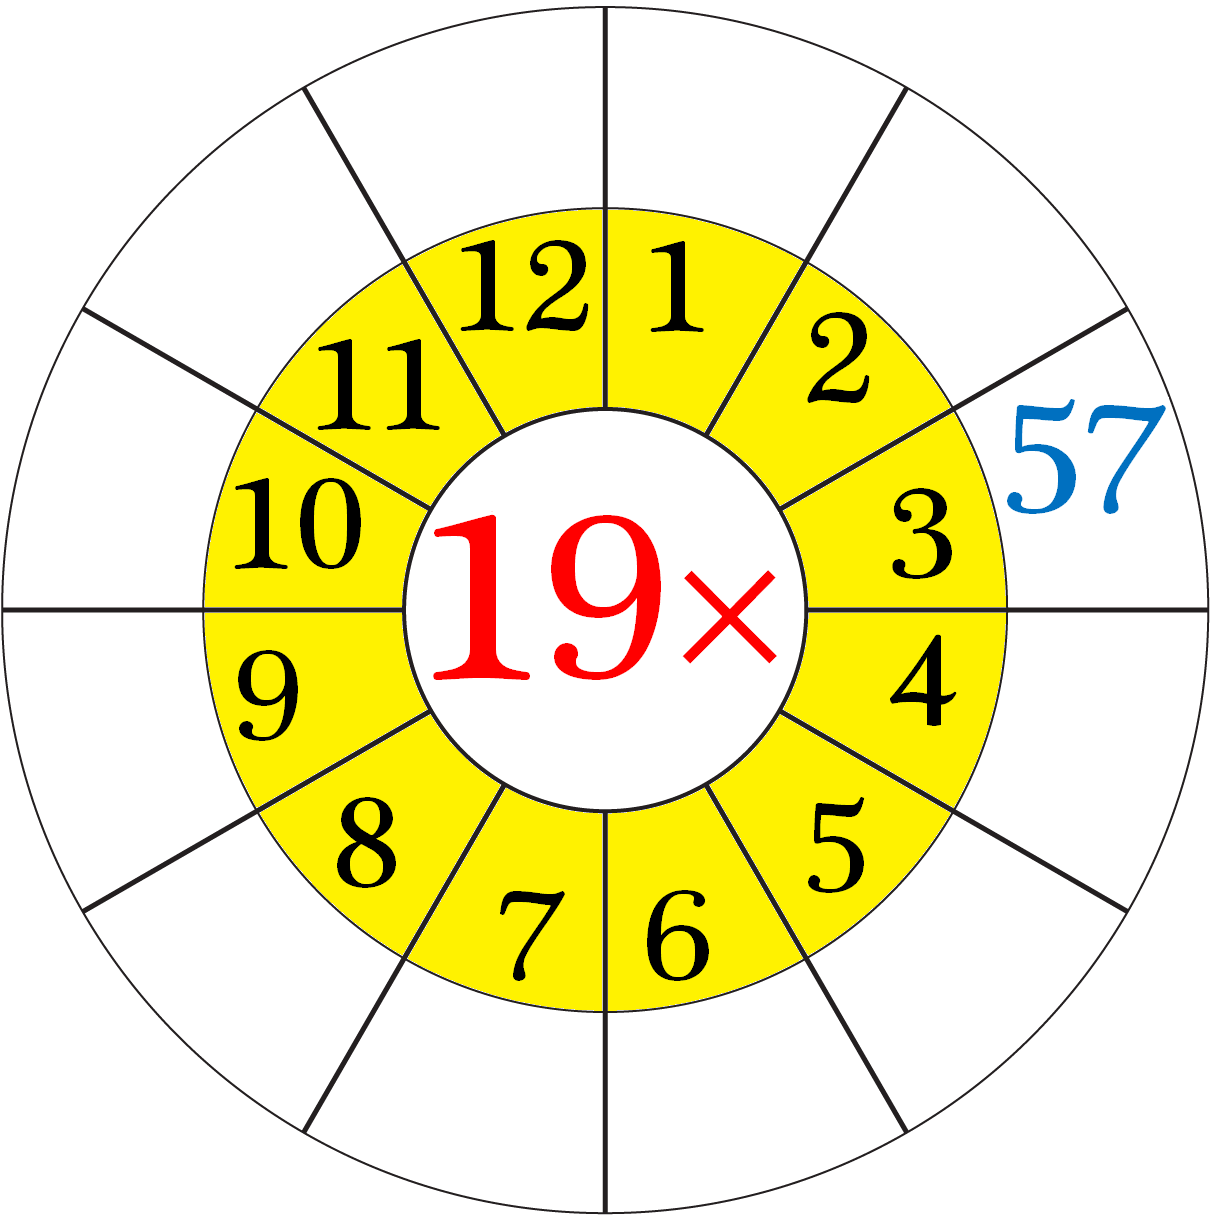 Worksheet on Multiplication Table of 19